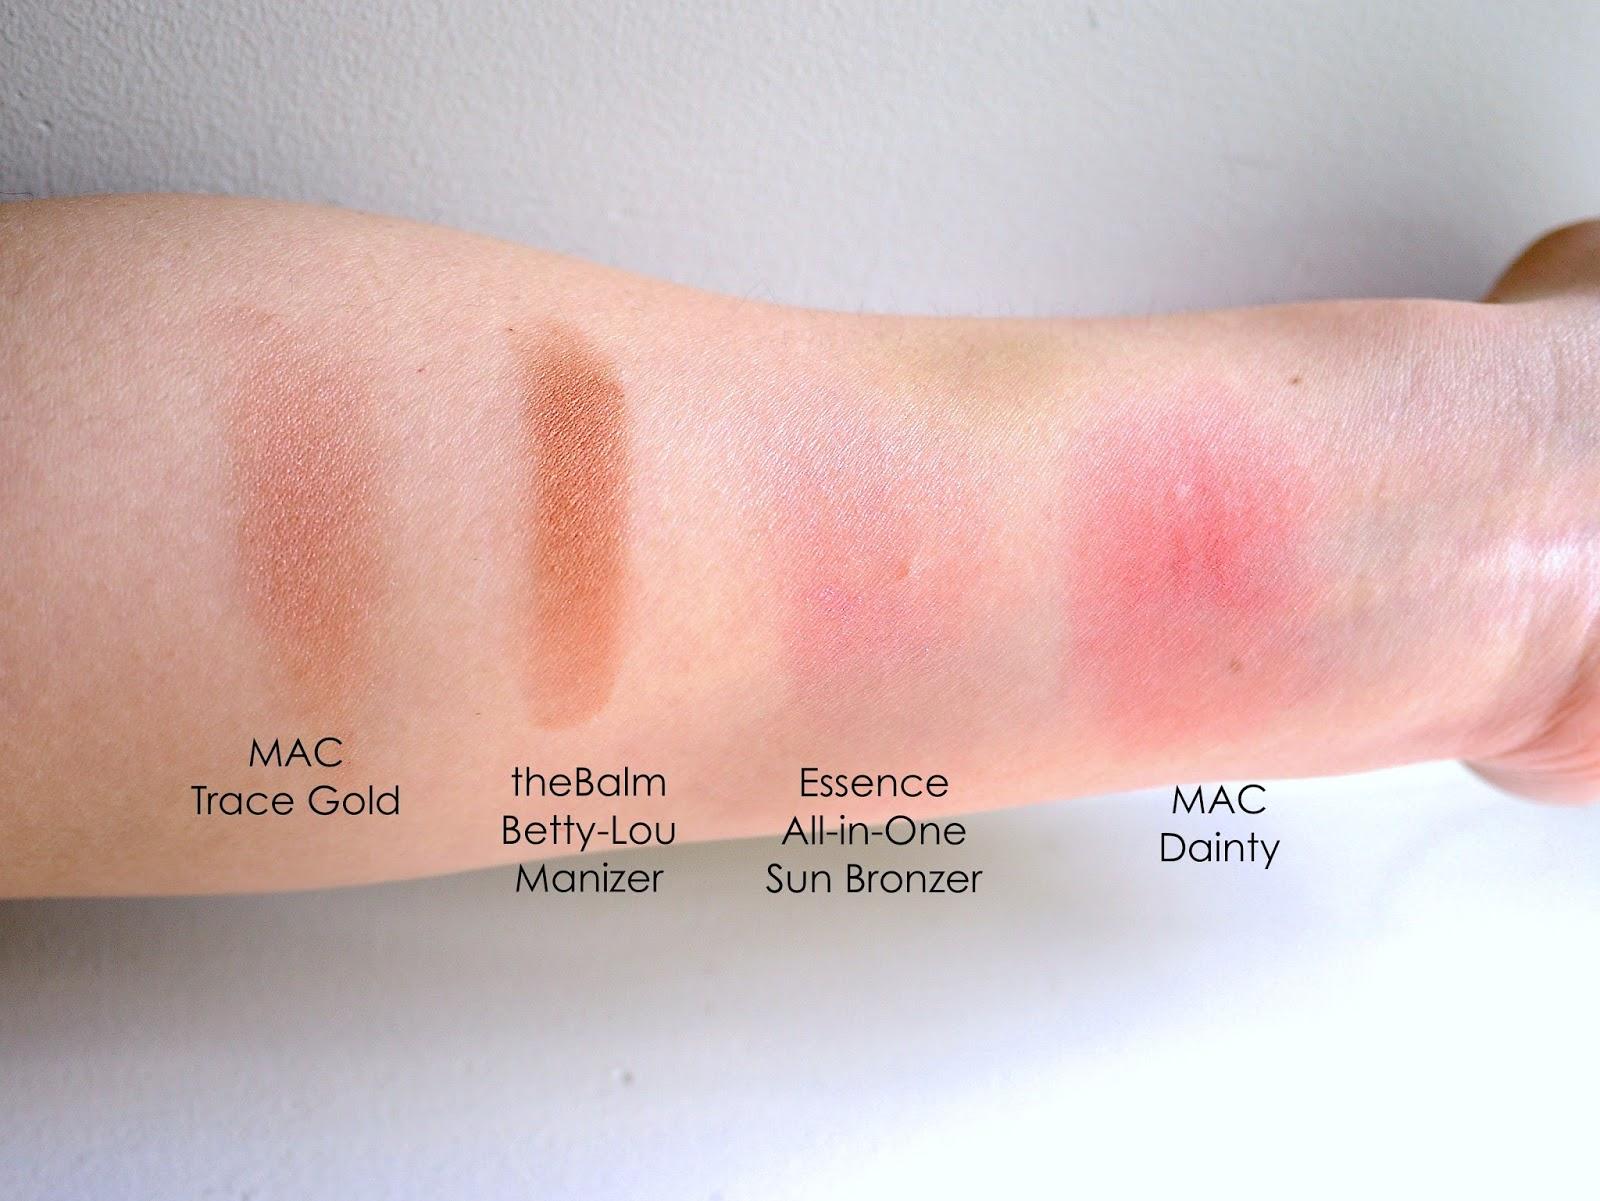 MAC trace gold theBalm Betty-Lou Manizer Essence All-in-One Sun Bronzer Mac Dainty blush swatch